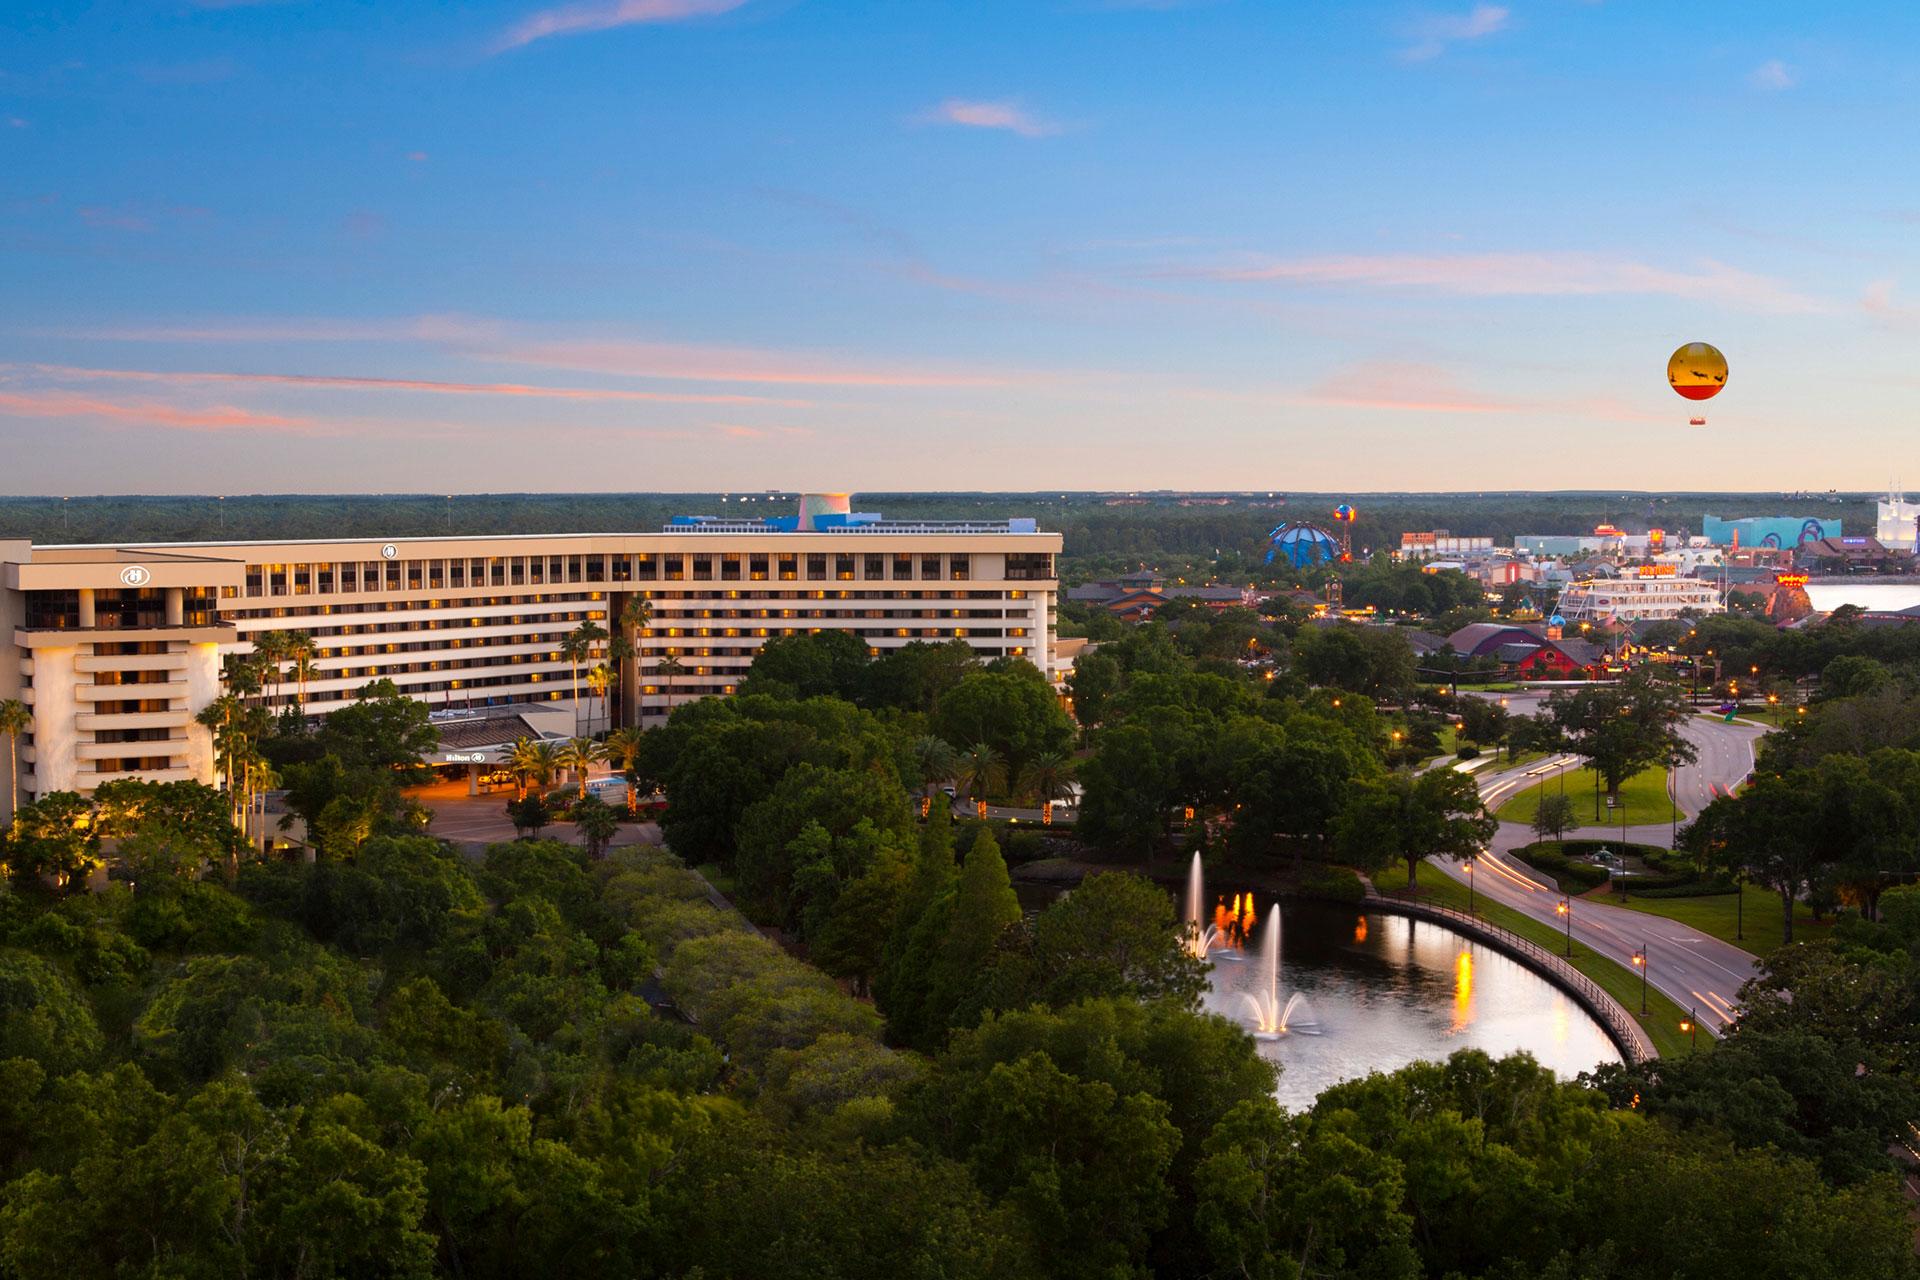 Aerial View of Hilton Orlando Lake Buena Vista - Disney Springs Area; Courtesy of Hilton Orlando Lake Buena Vista - Disney Springs Area